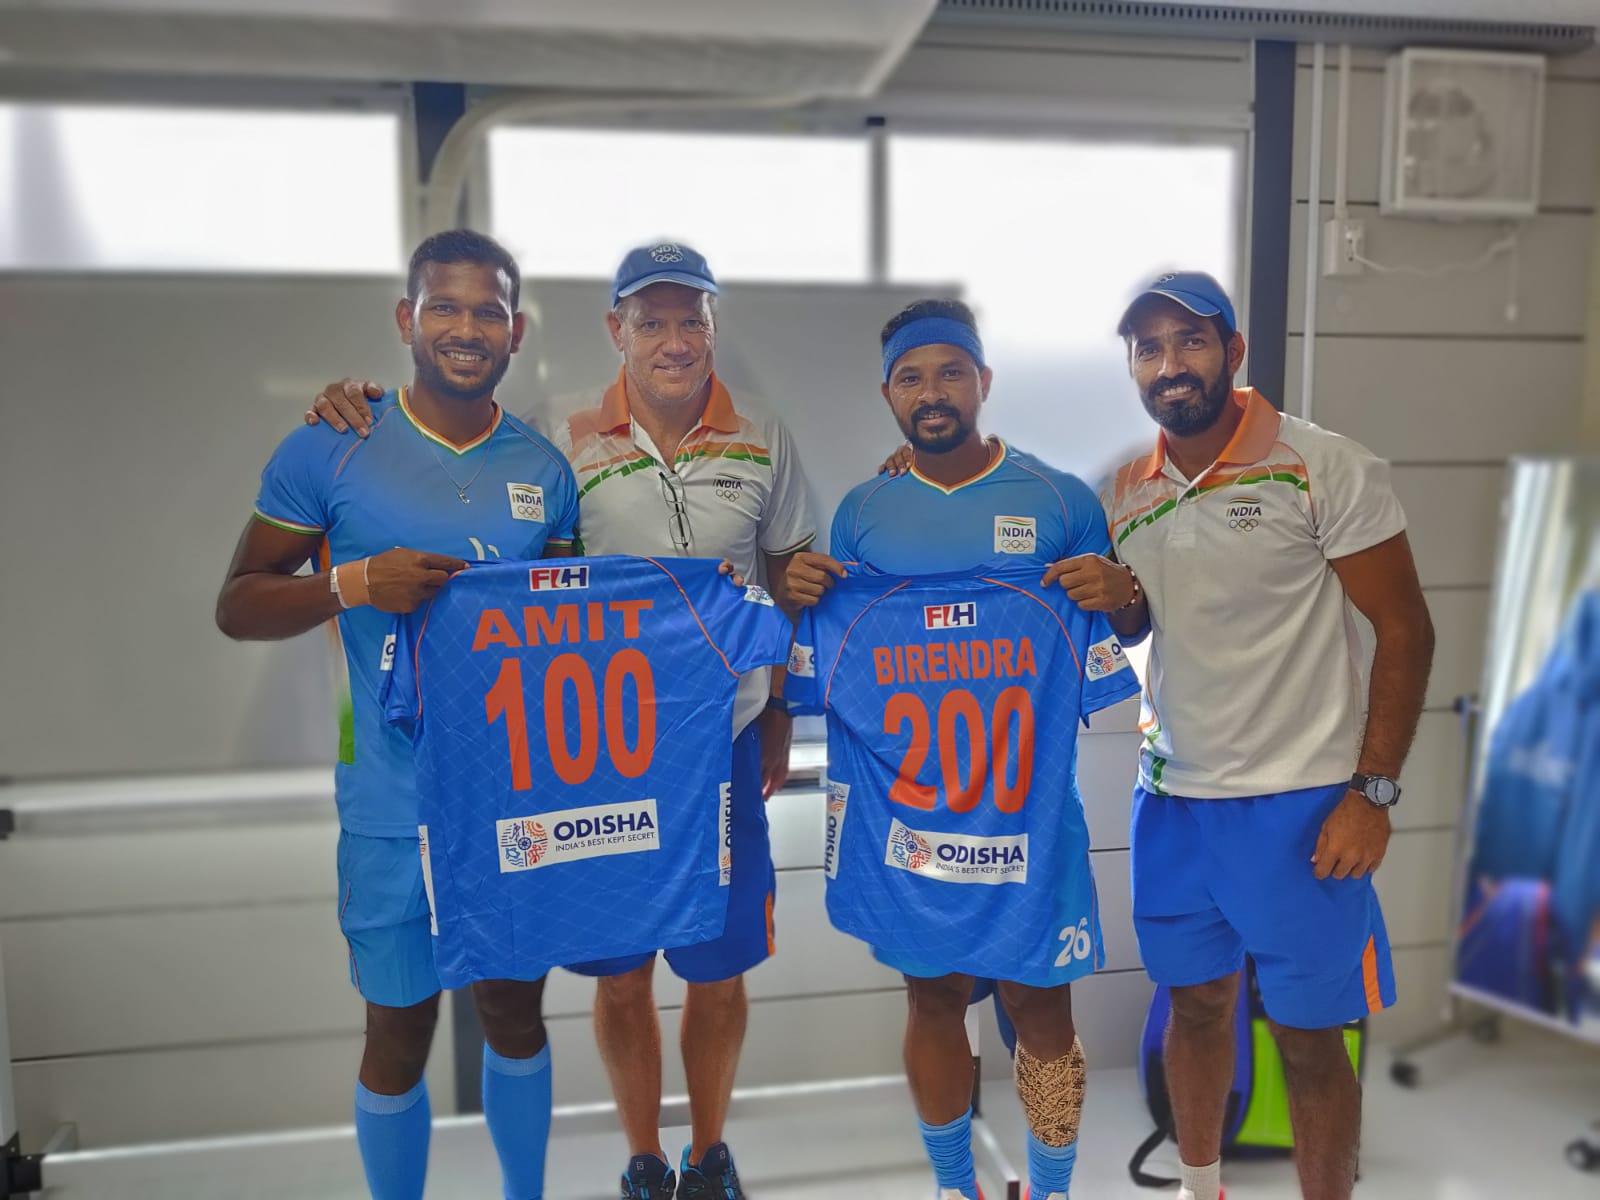 Odisha Hockey Stars Birendra Lakra & Amit Rohidas Achieve Unique Milestones  – Odisha Bytes